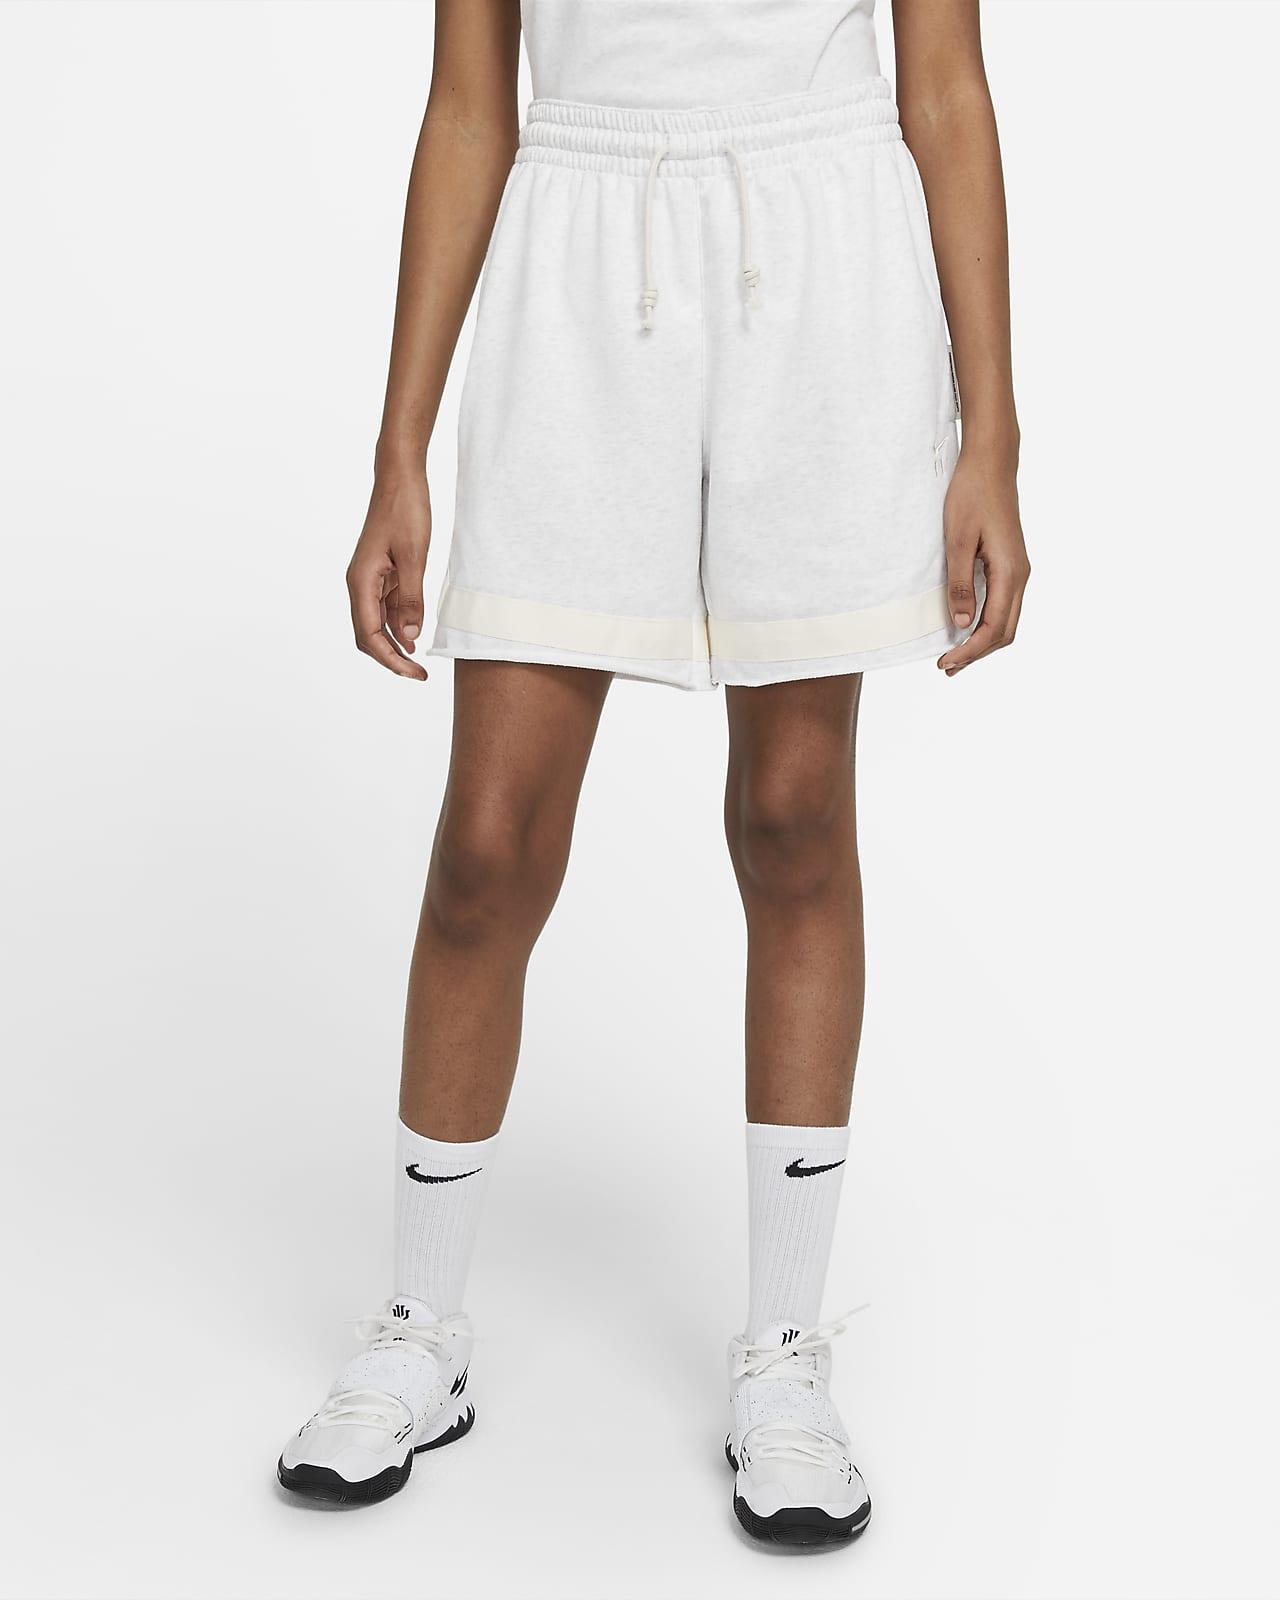 Short de basketball Nike Standard Issue Swoosh Fly pour Femme